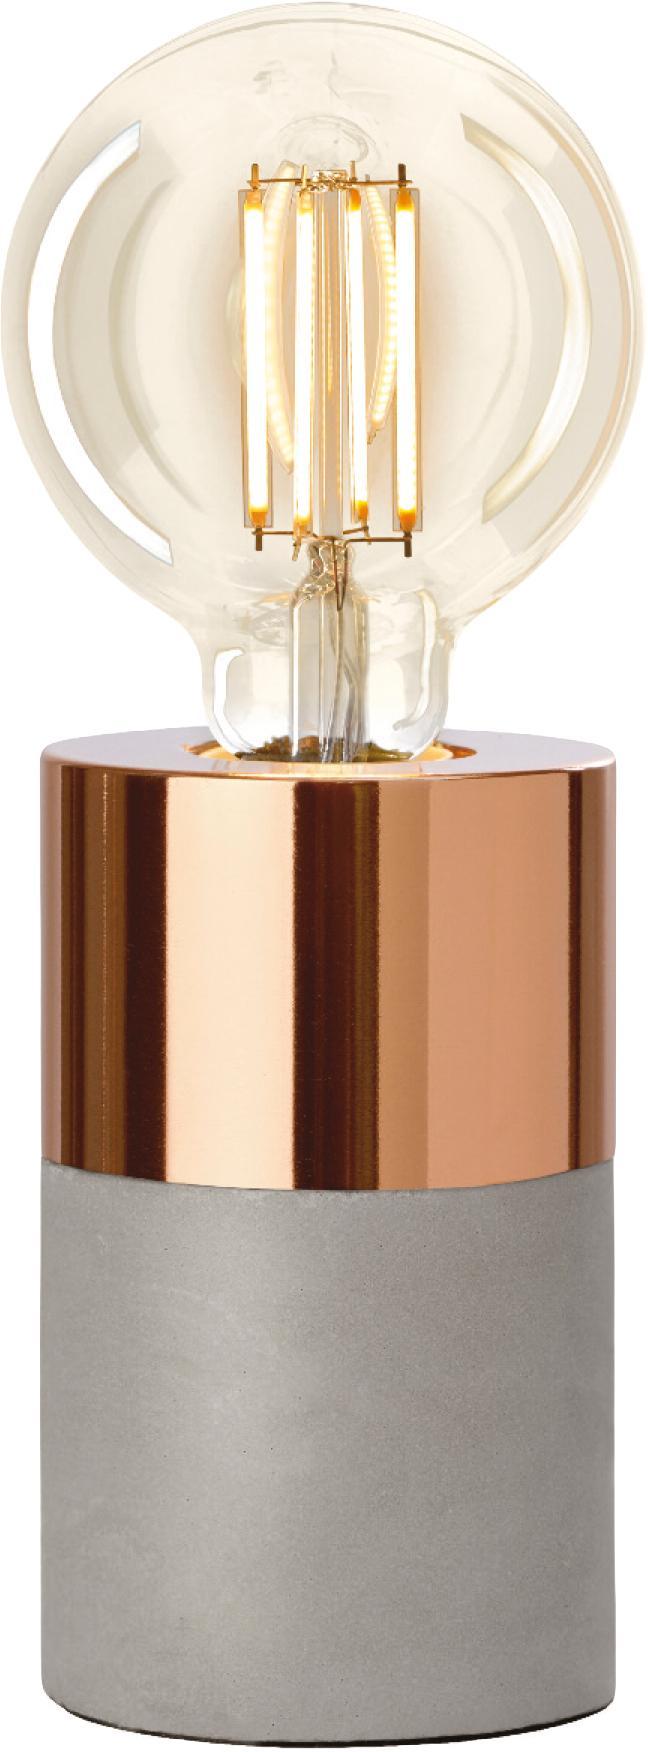 Betonnen tafellamp Athen, Grijs, koperkleurig, Ø 8 x H 14 cm